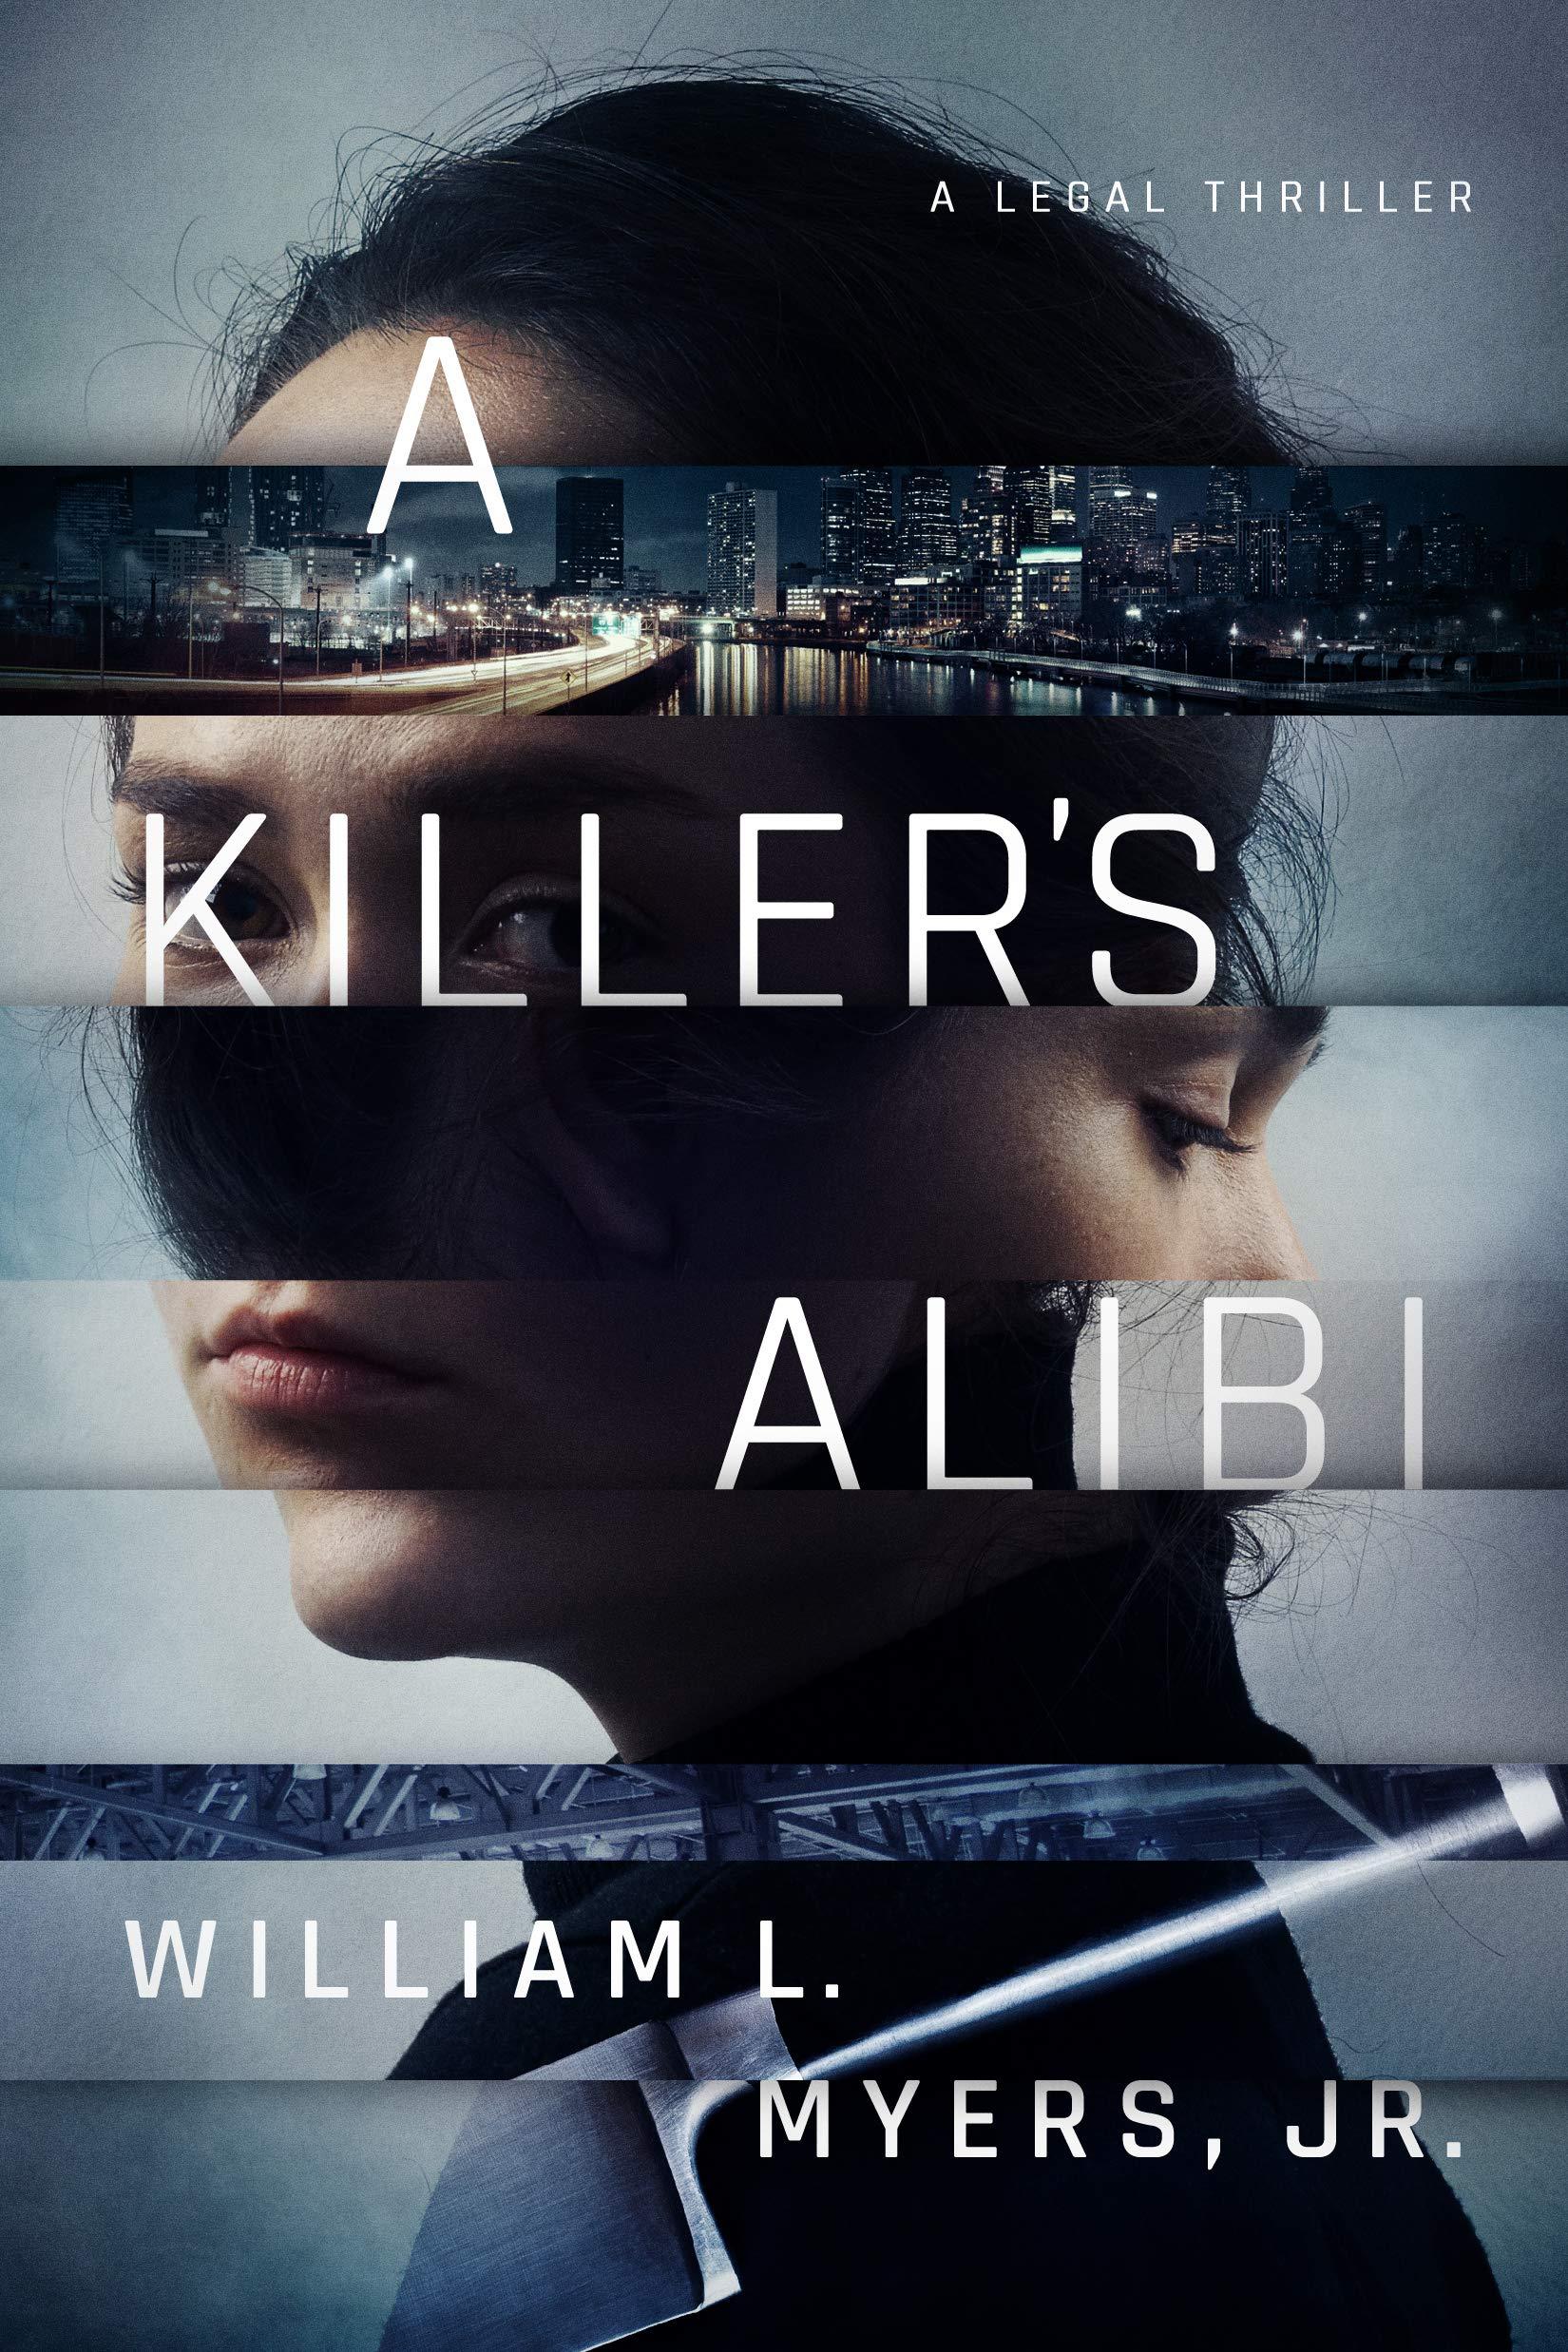 A KILLER'S ALIBI by William L. Meyers, Jr.